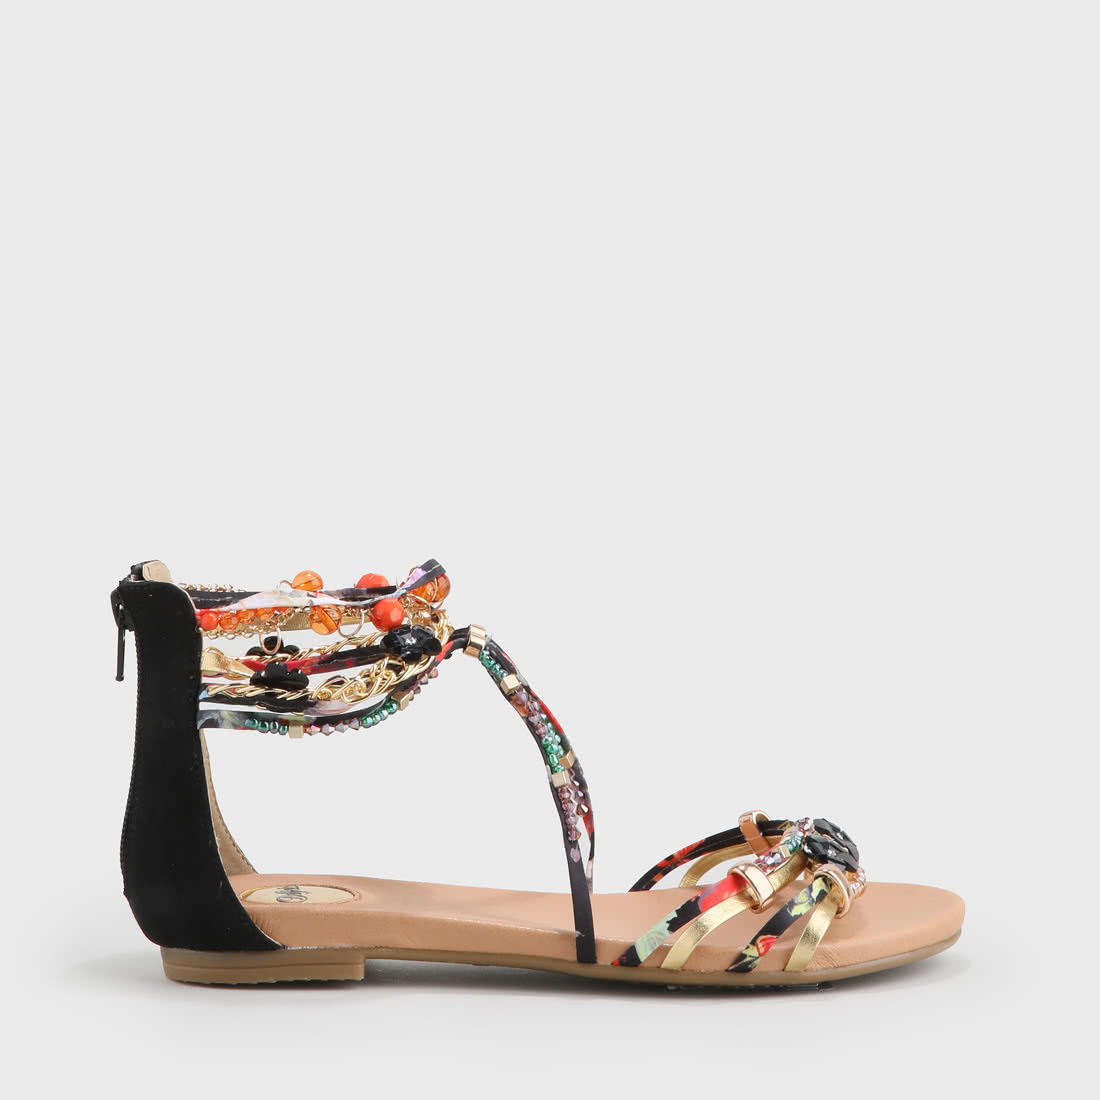 1f455bd5136 Elora Sandals Suede Look Navy/Red